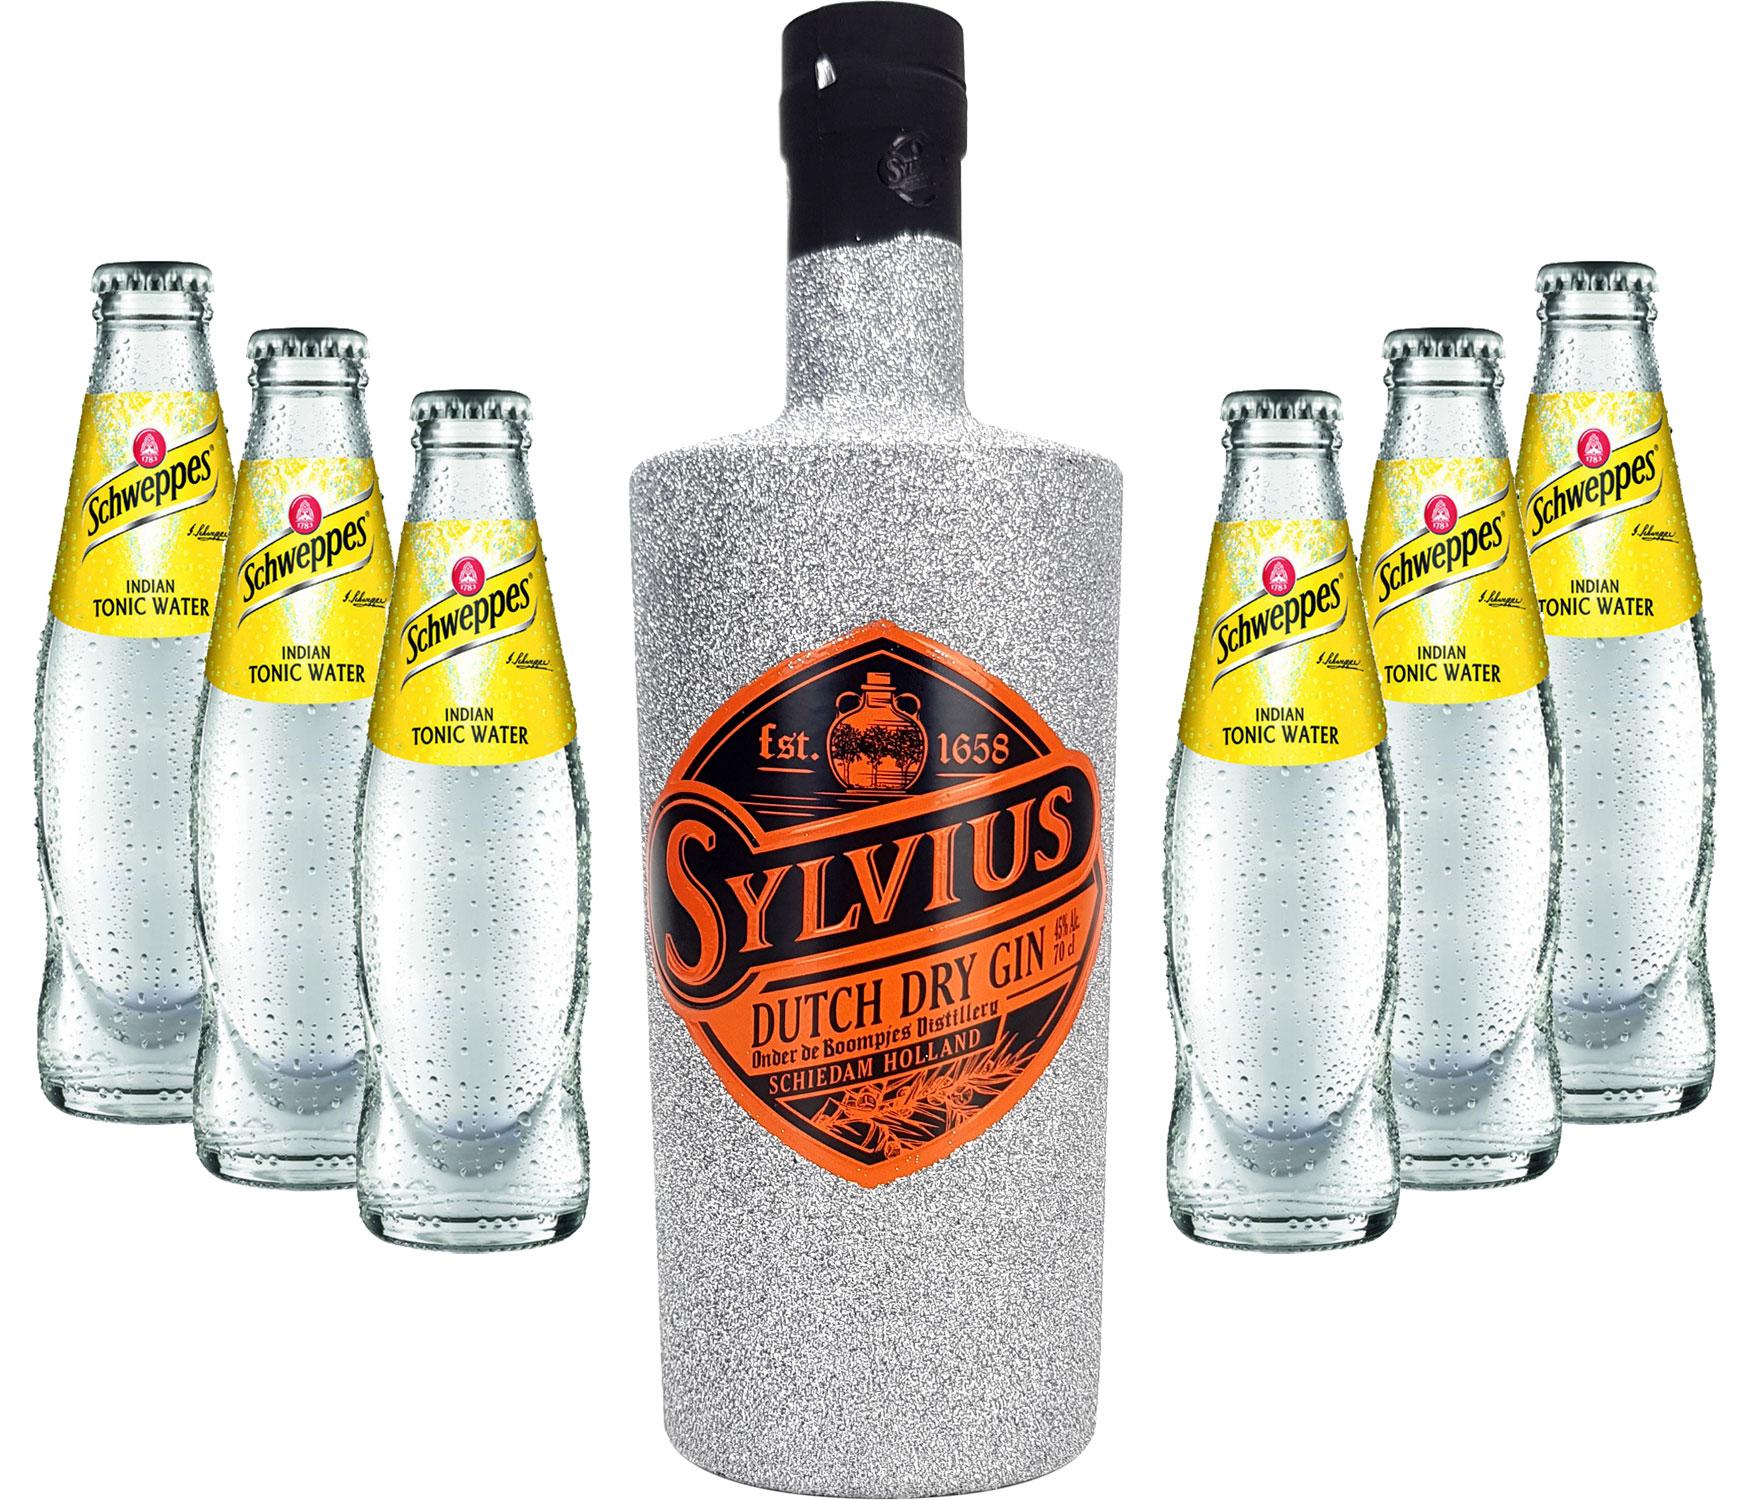 Gin Tonic Bling Bling Silber Glitzer Set Geschenkset - Sylvius Dutch Gin 0,7l 700ml (45% Vol) + 6x Schweppes Tonic Water 200ml inkl. Pfand MEHRWEG -[Enthält Sulfite]